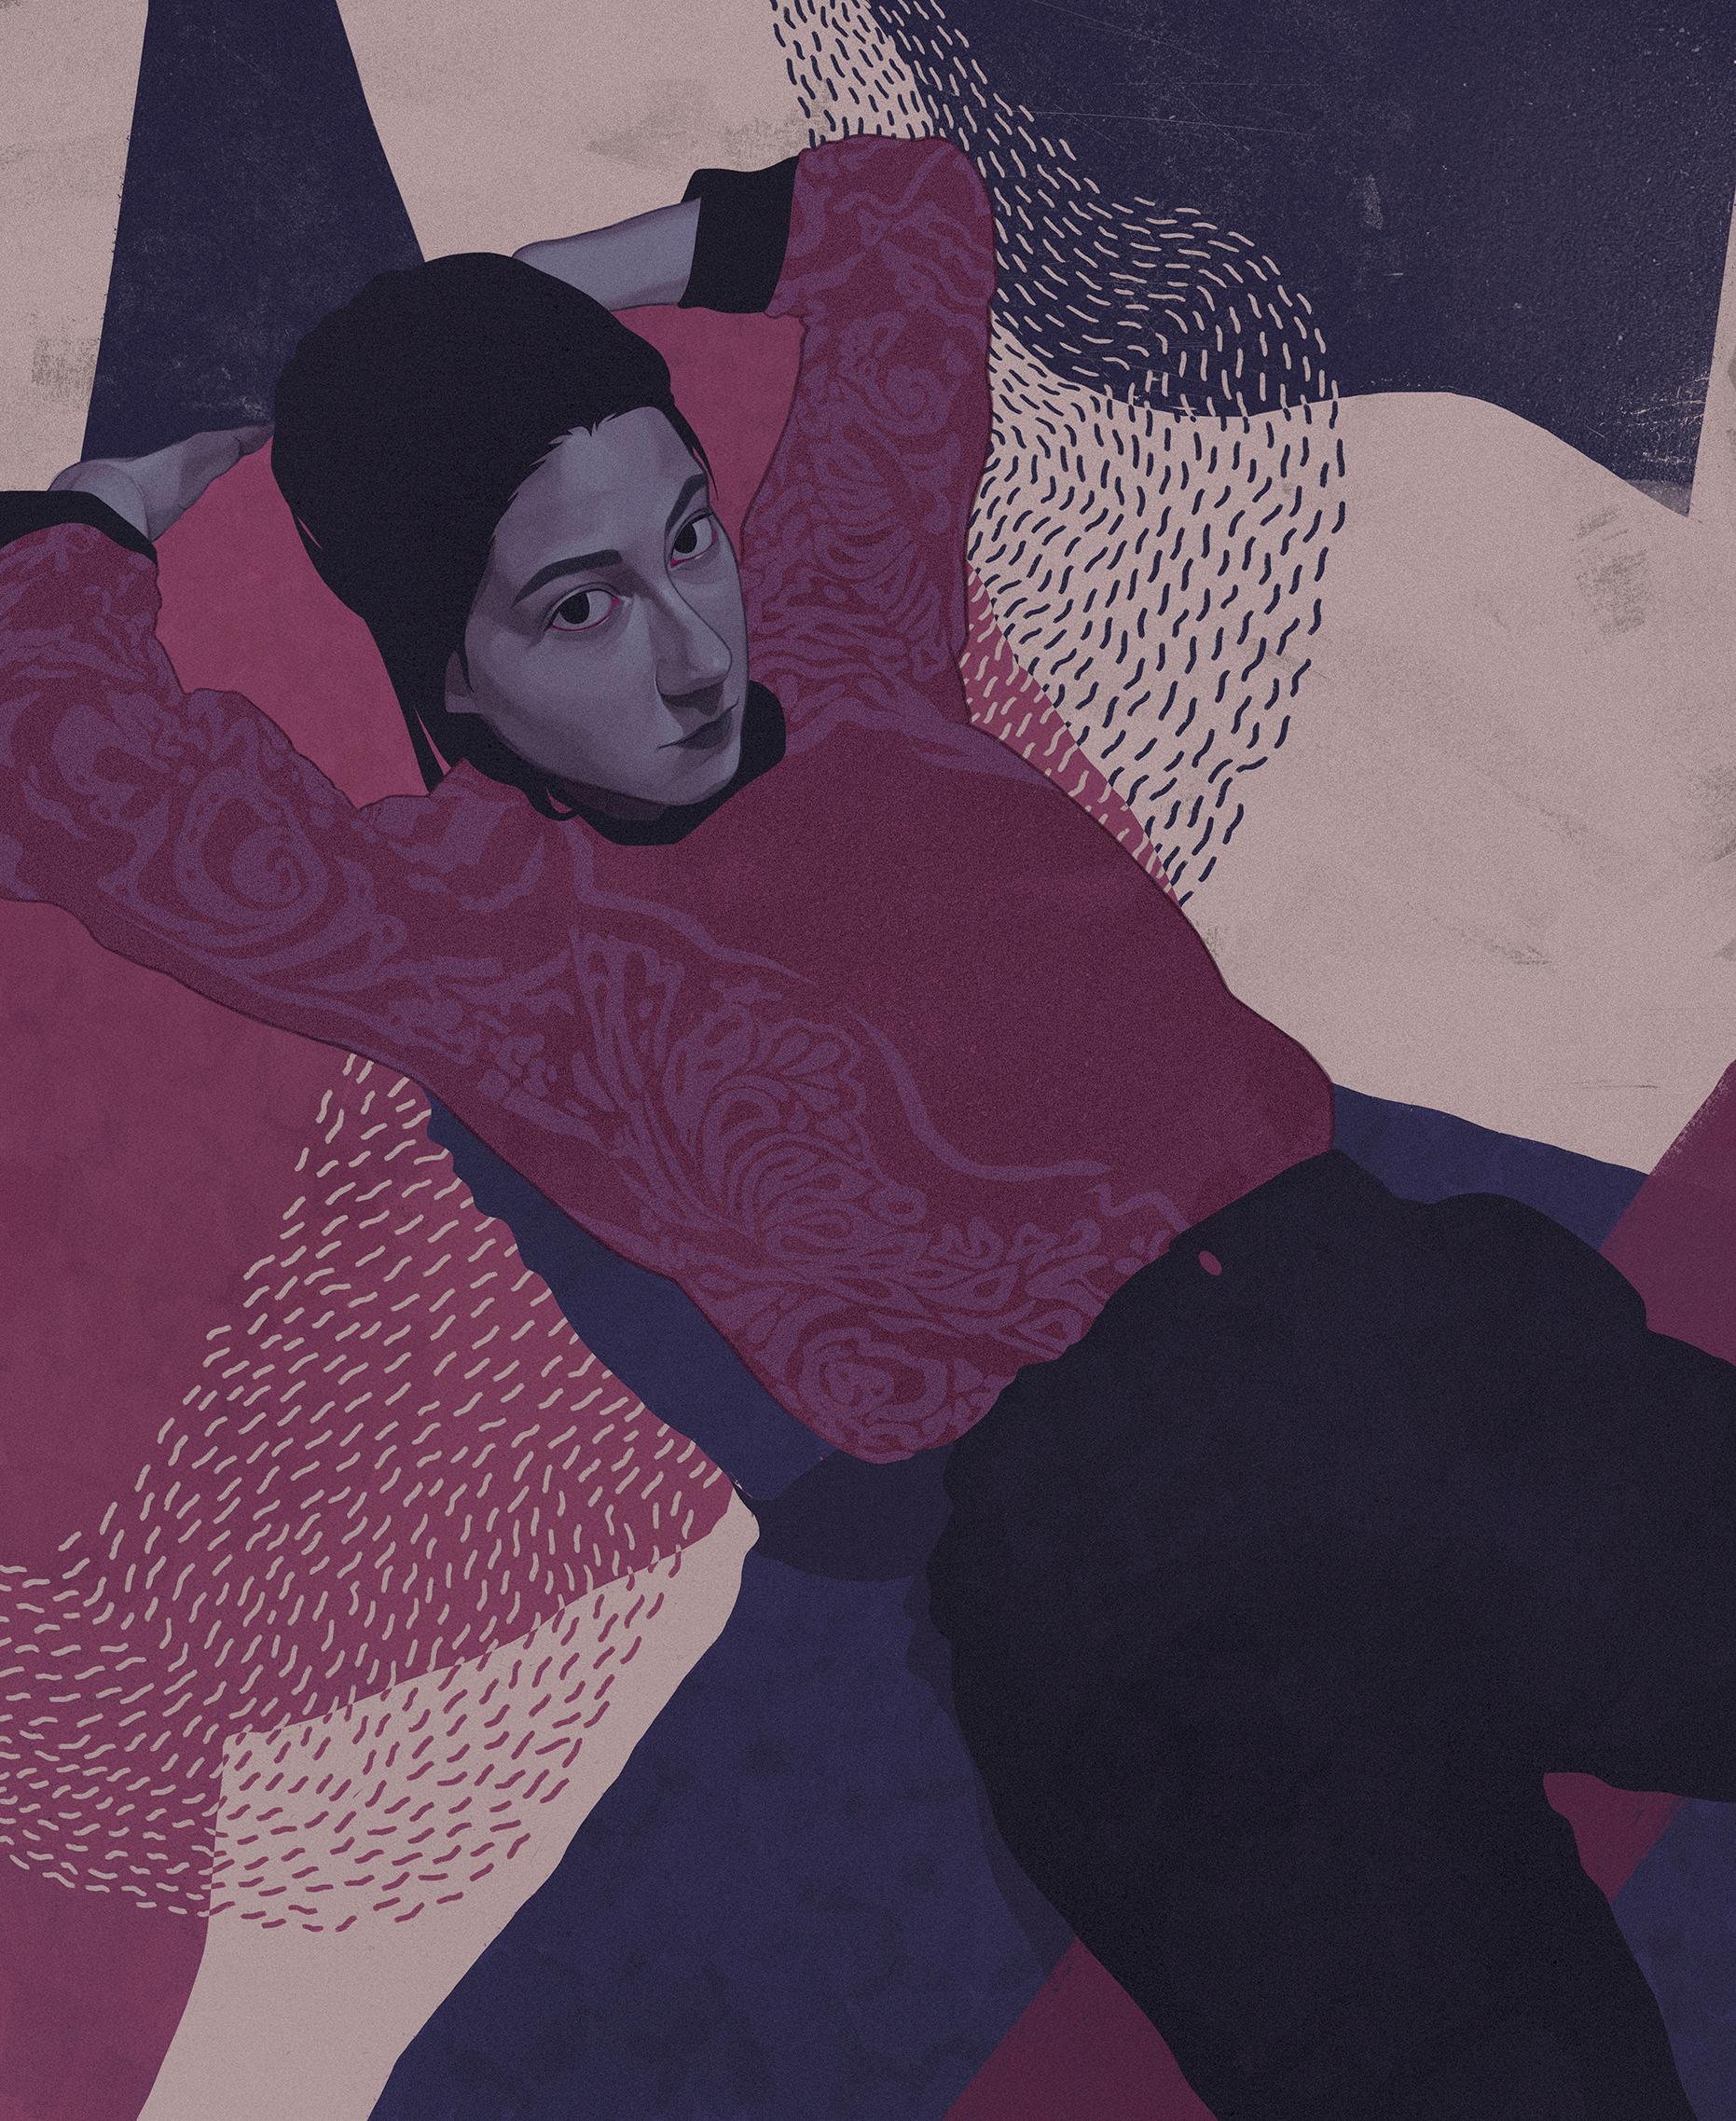 Enchanting Illustrations by Ana Godis